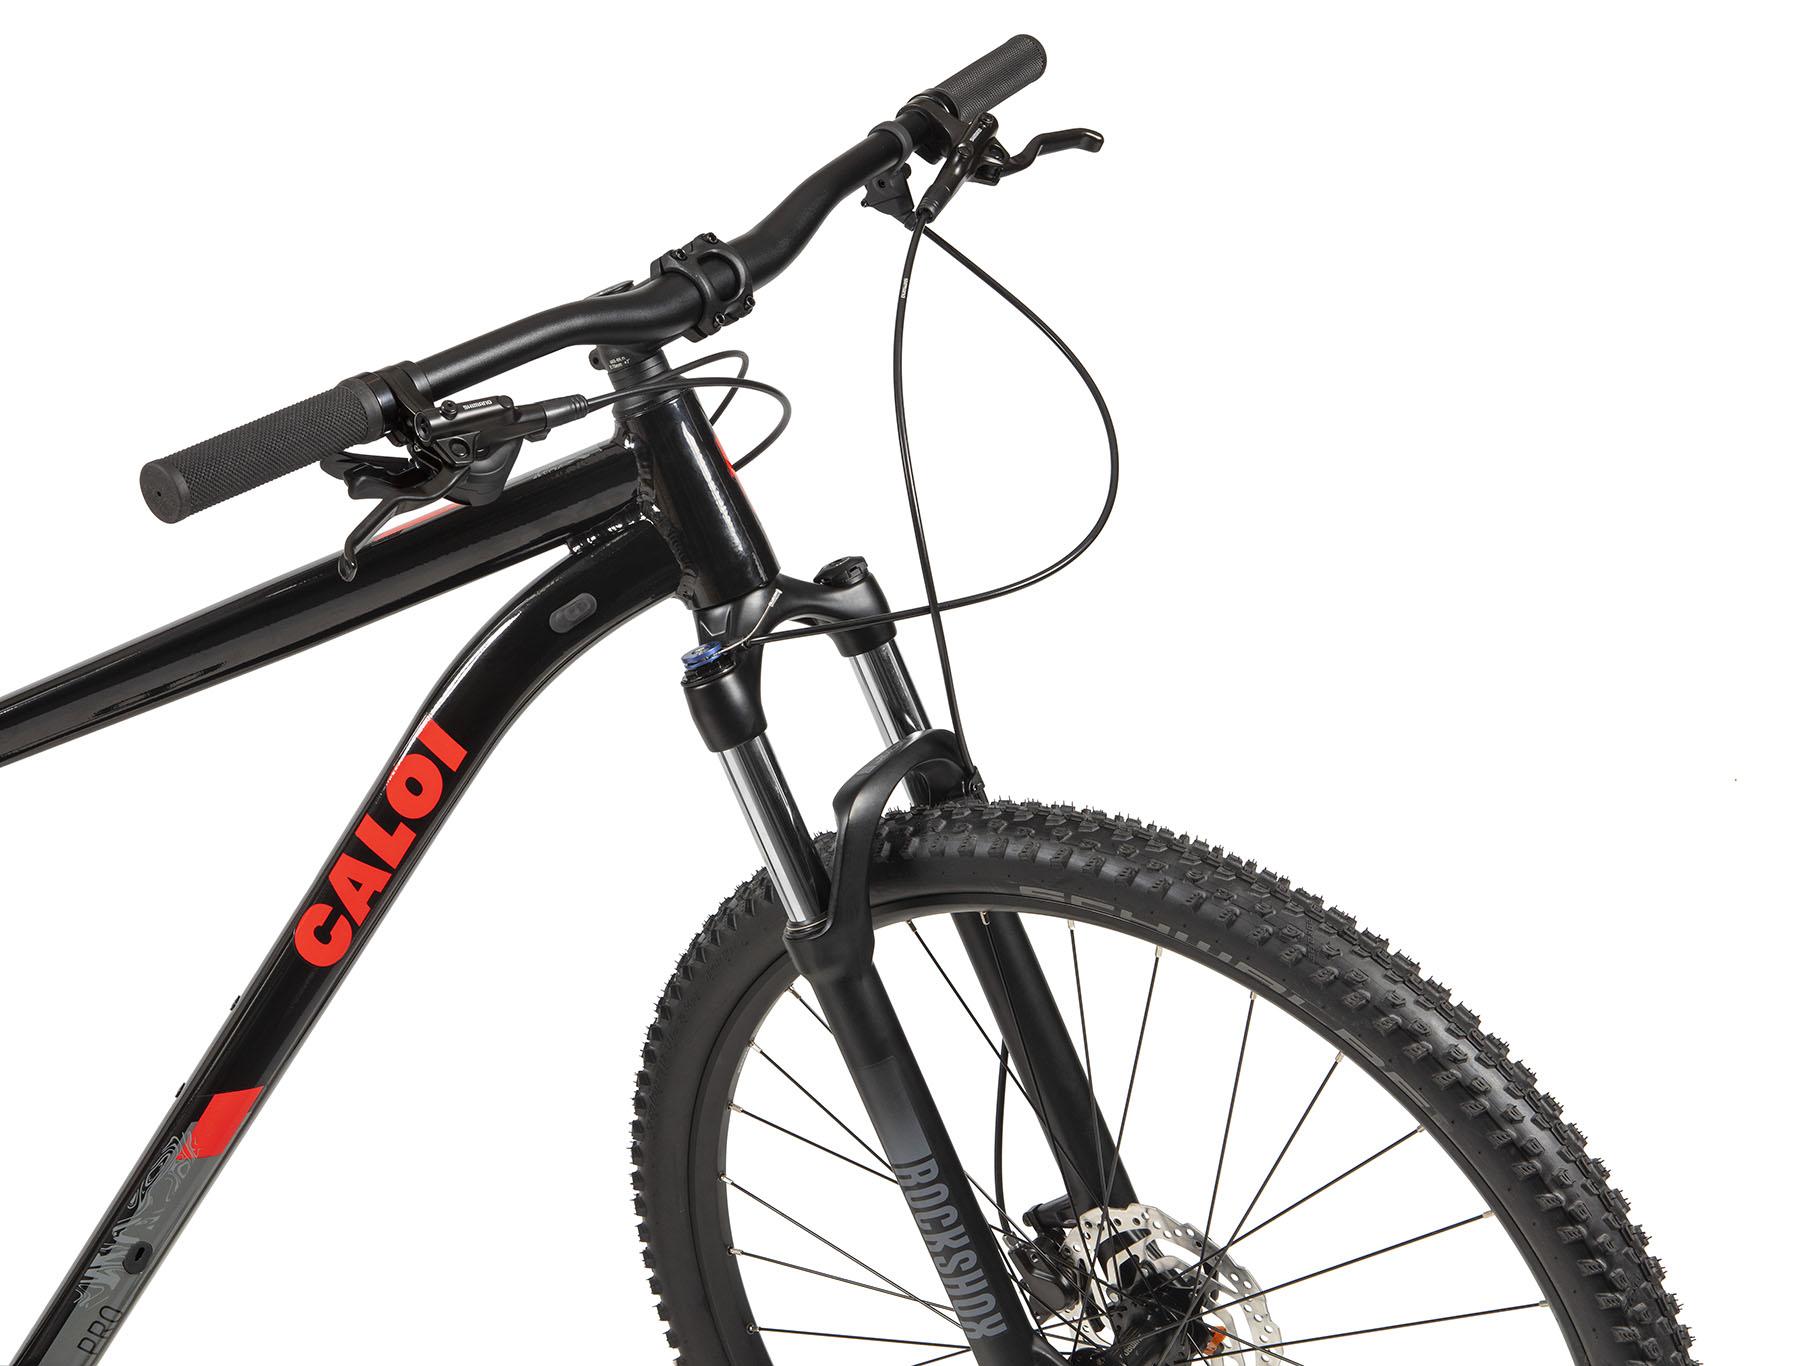 Bicicleta Aro 29 Explorer Pro 11v - Caloi